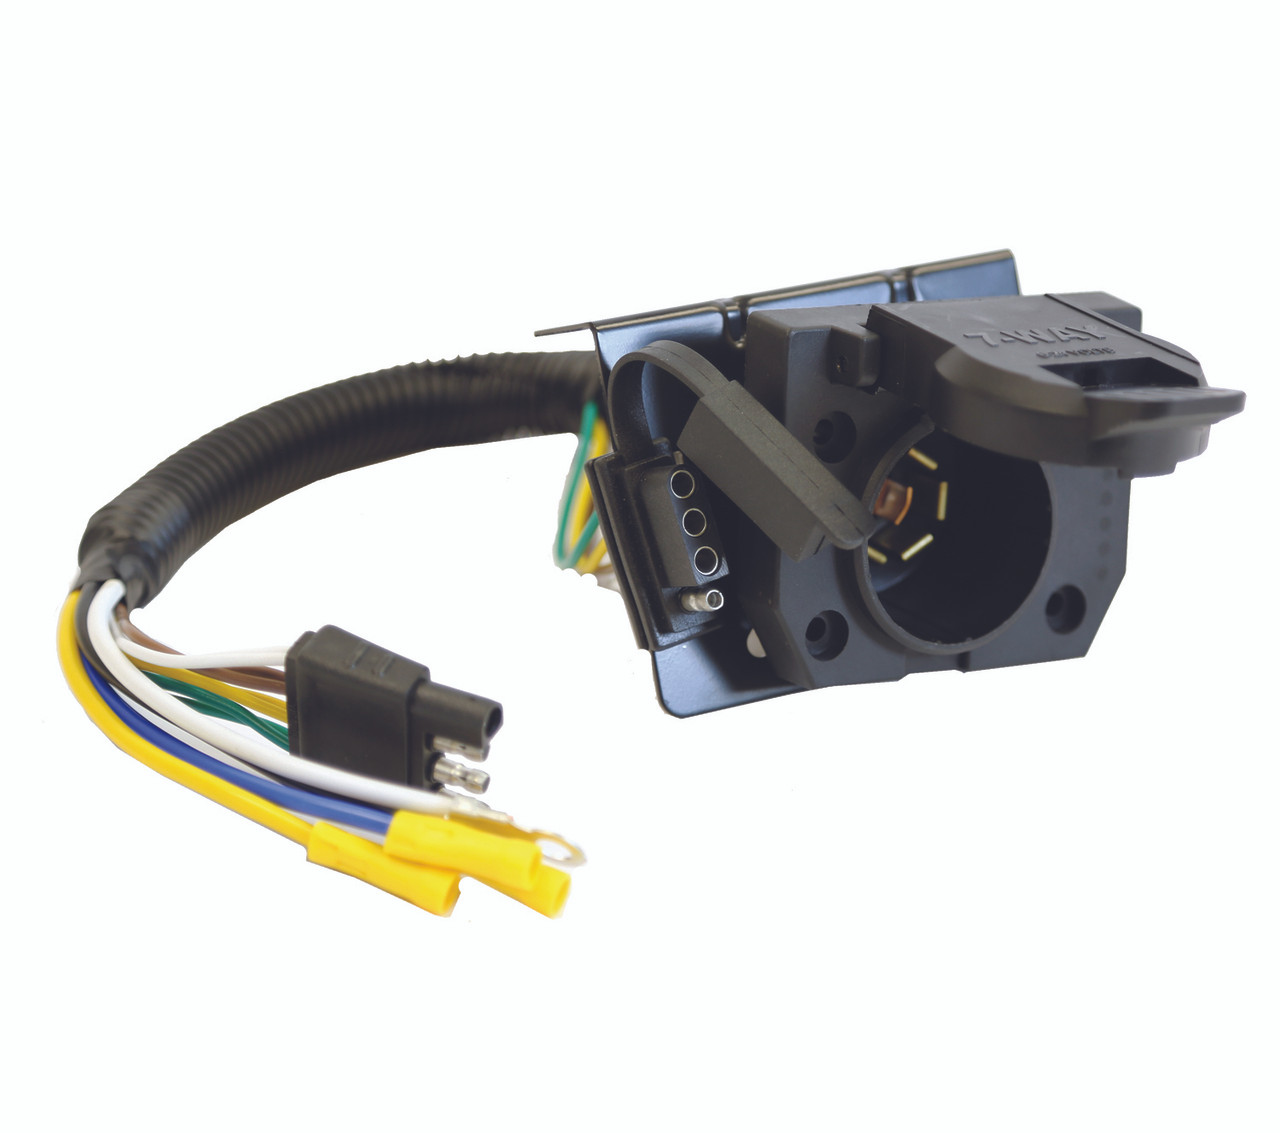 medium resolution of 37185 4 prong flat to 4 prong flat and 7 way flat pin adapter croft trailer supply